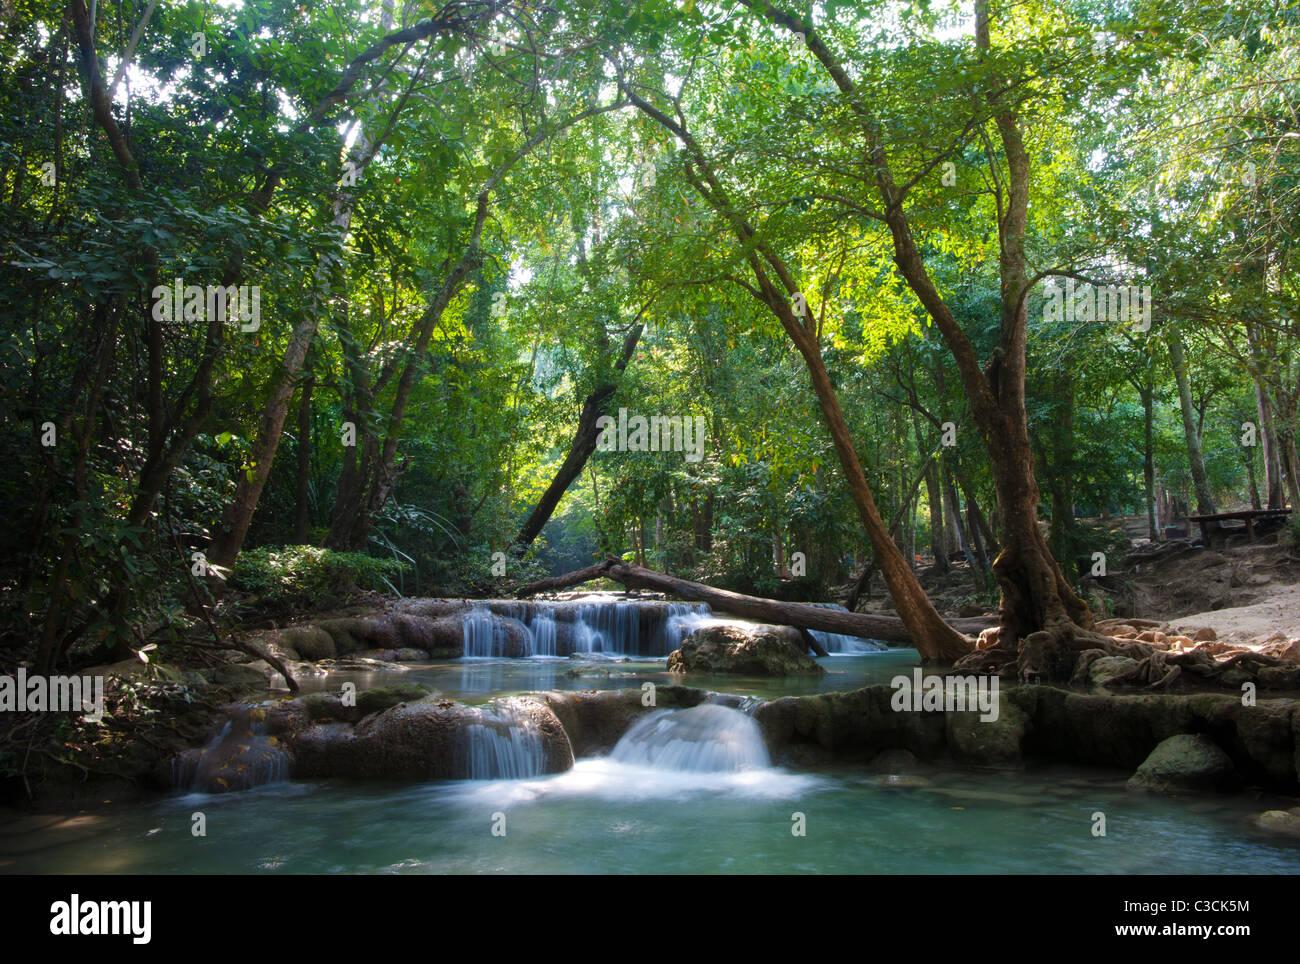 Hermosa Cascada Cascadas de erawan kanachanburi Tailandia Imagen De Stock